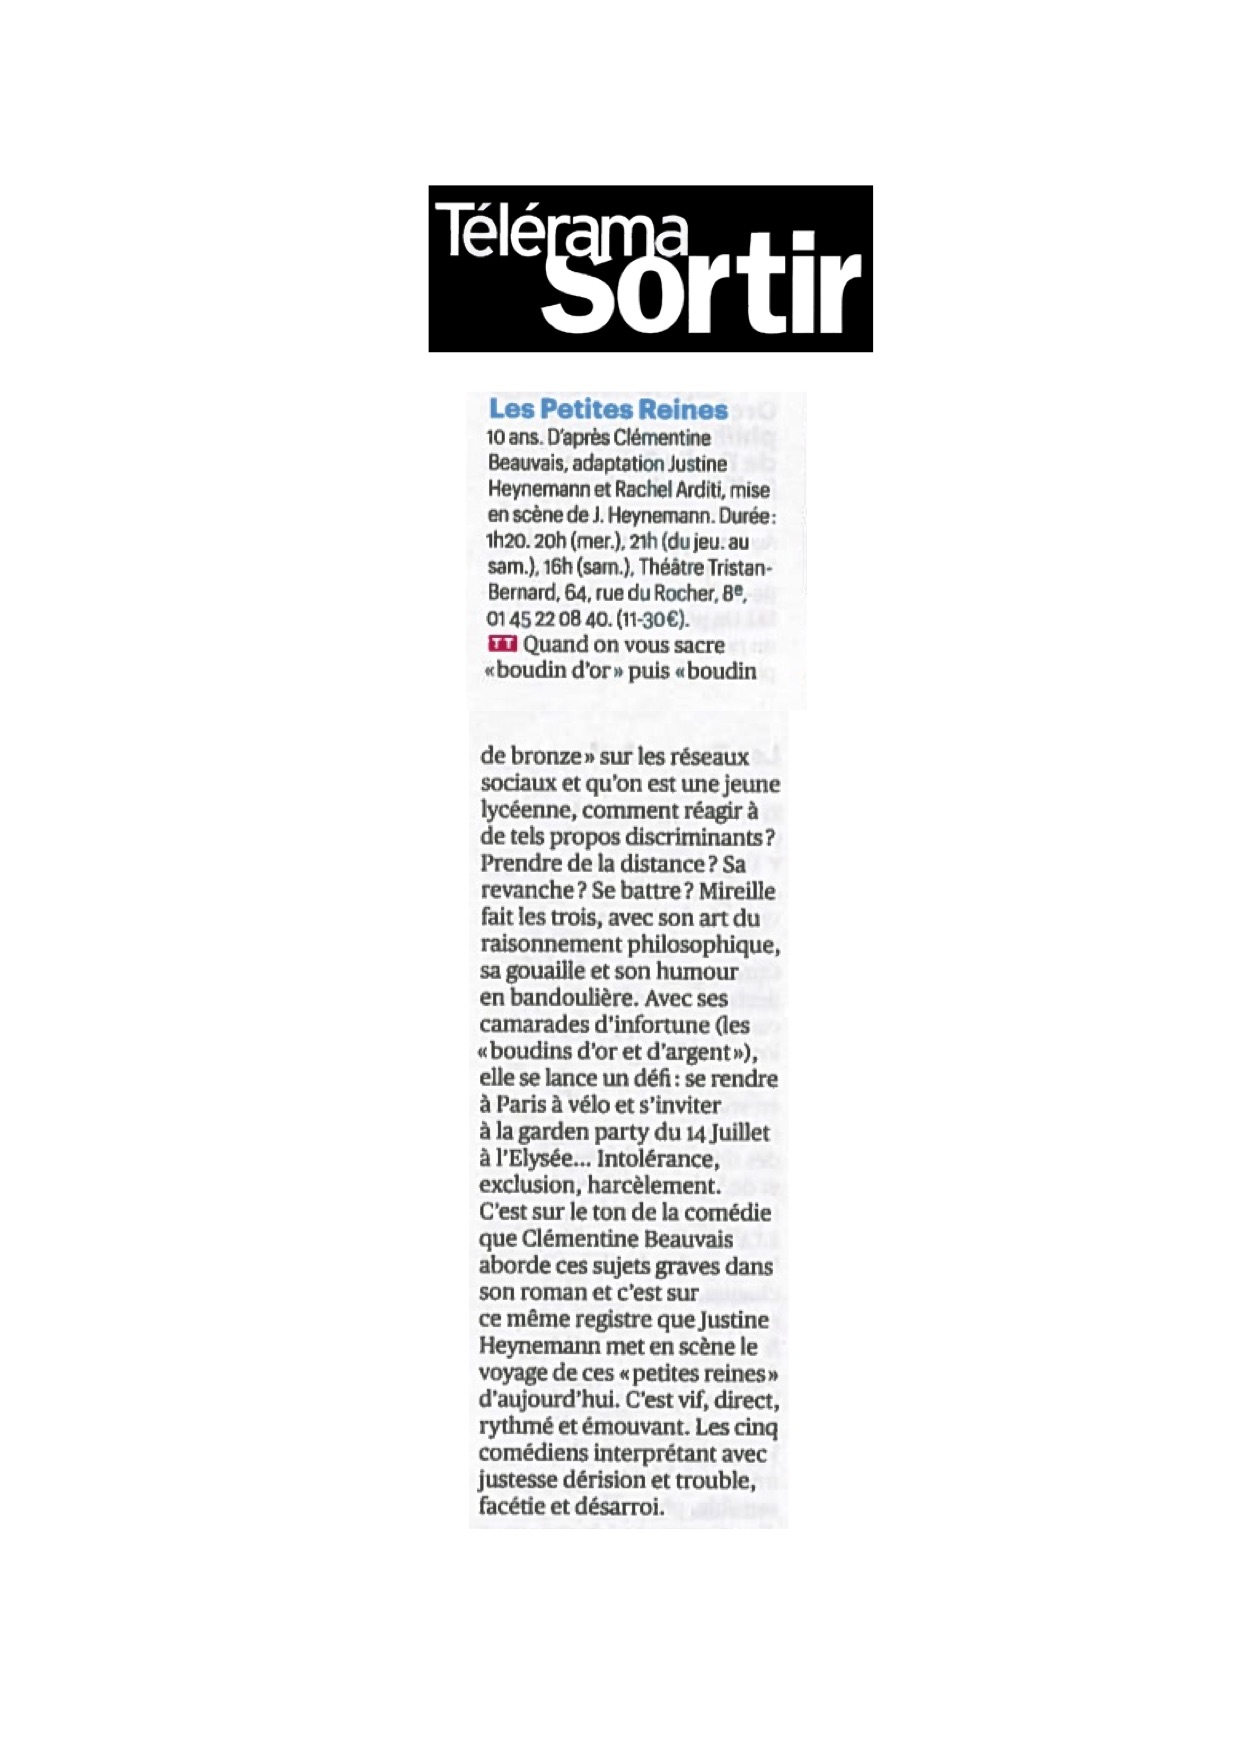 Télérama Sortie 06.06.18